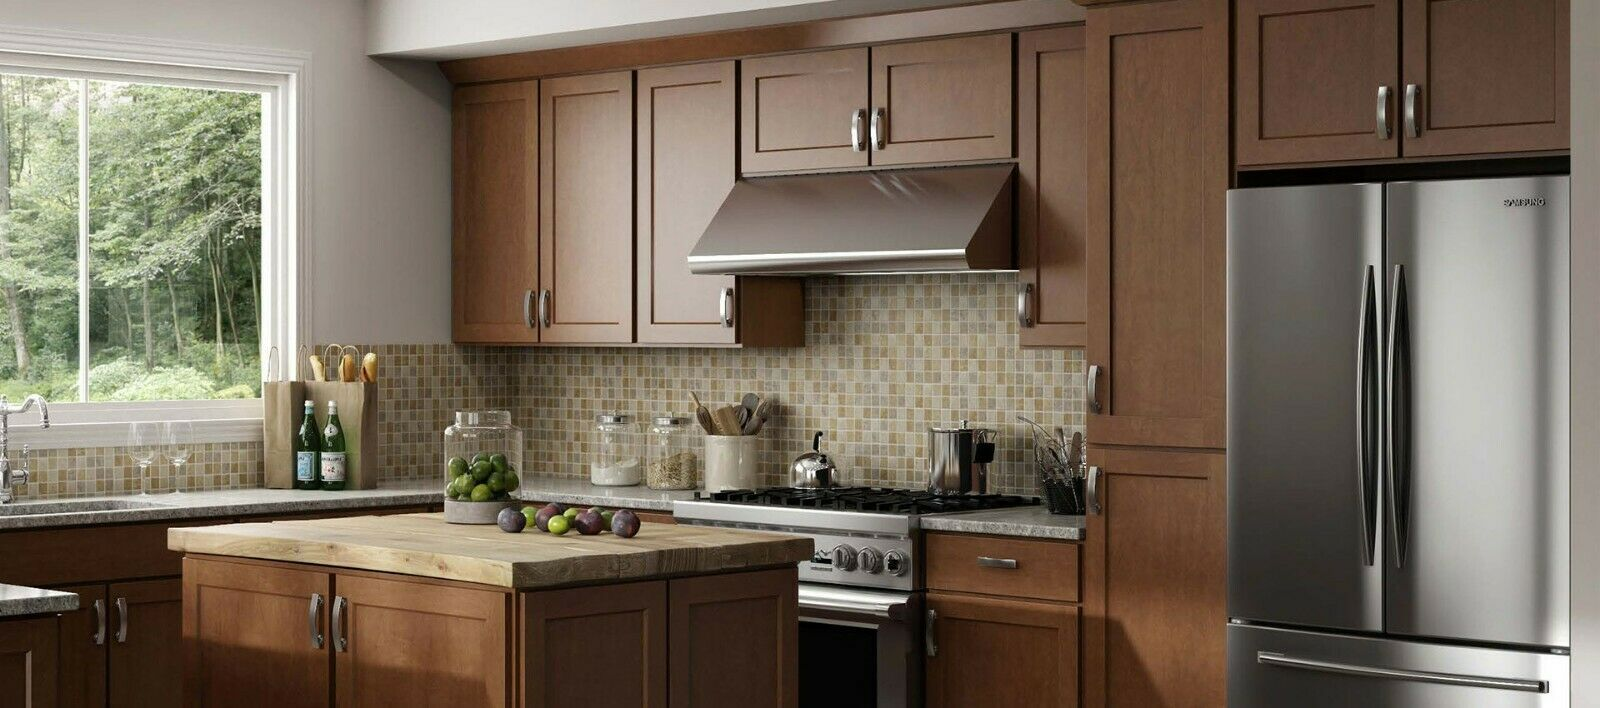 All Wood Rta 10x10 Luxor Cinnamon Brown Kitchen Cabinets Finger Grip Door Kitchen Cabinets Ide In 2020 Cheap Kitchen Cabinets Brown Kitchen Cabinets Brown Kitchens